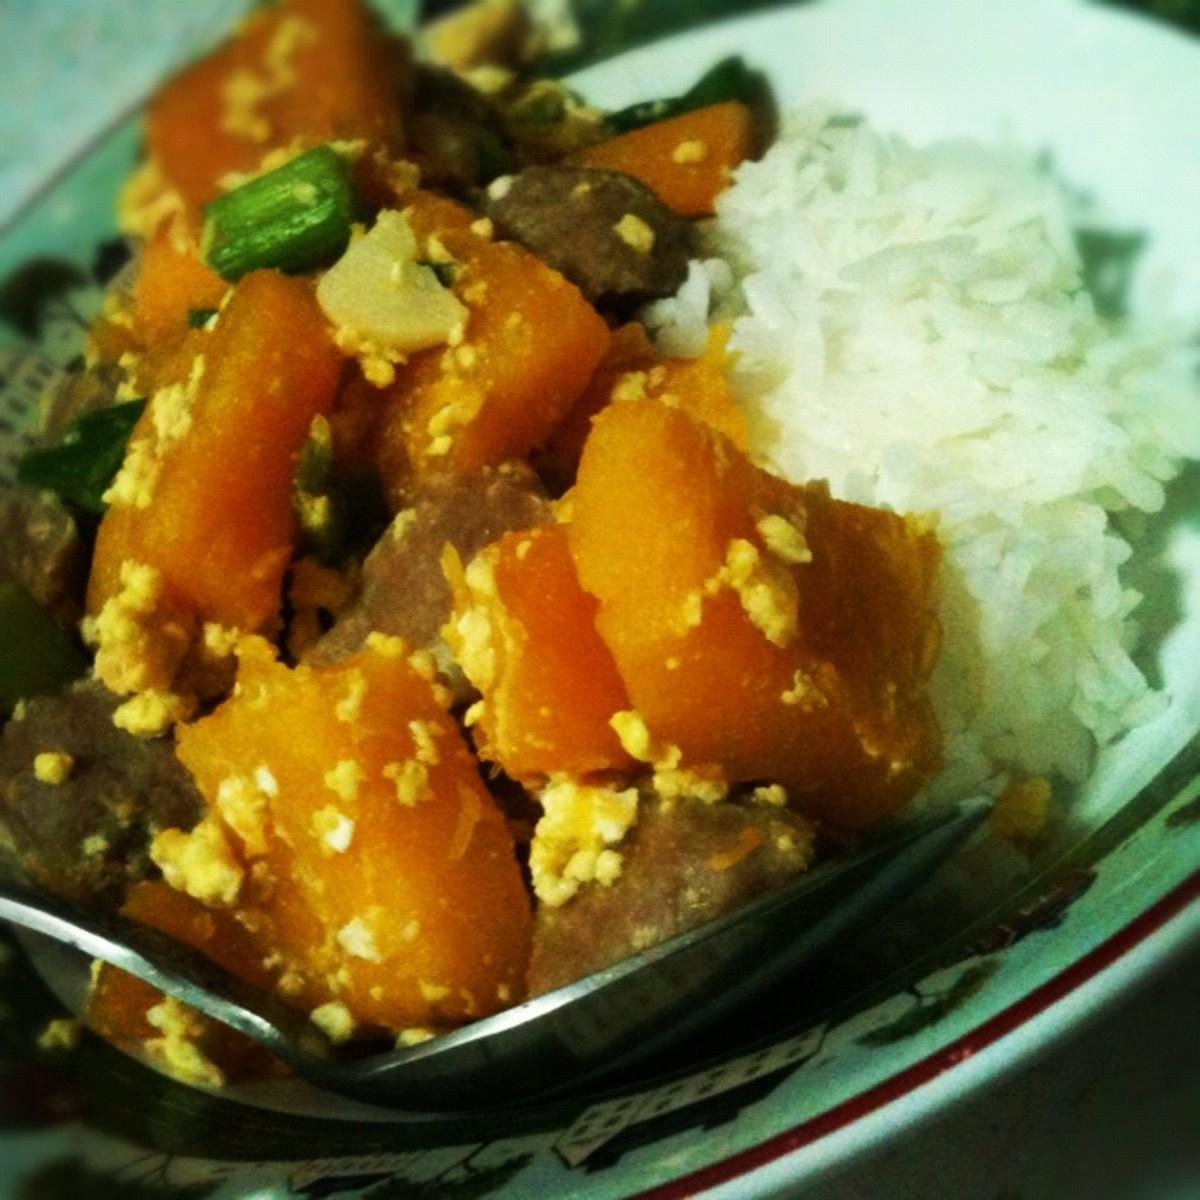 Thai Pumpkin Stir Fry with Steamed Rice